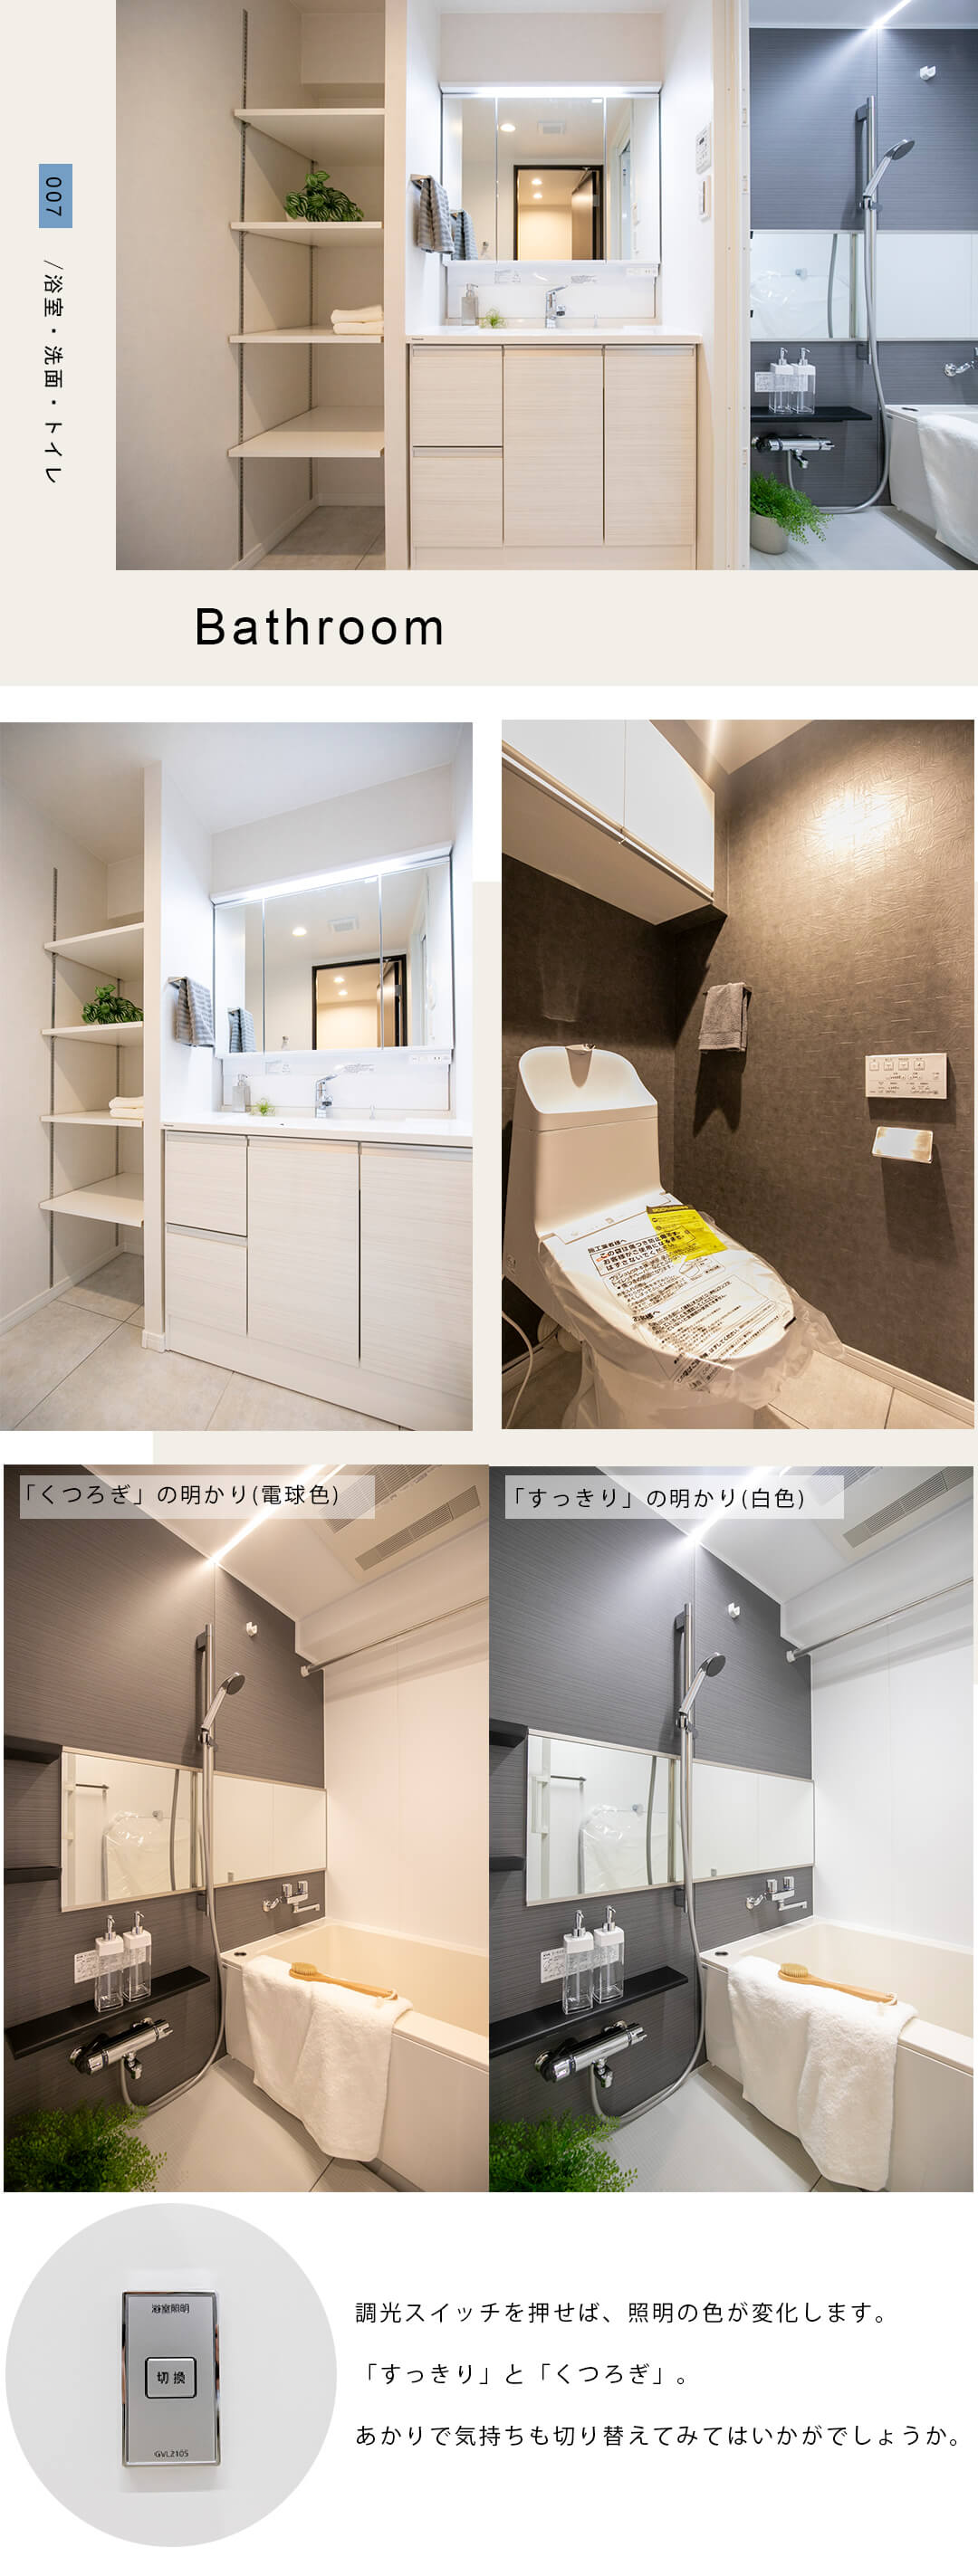 007,Bathroom,浴室・洗面・トイレ